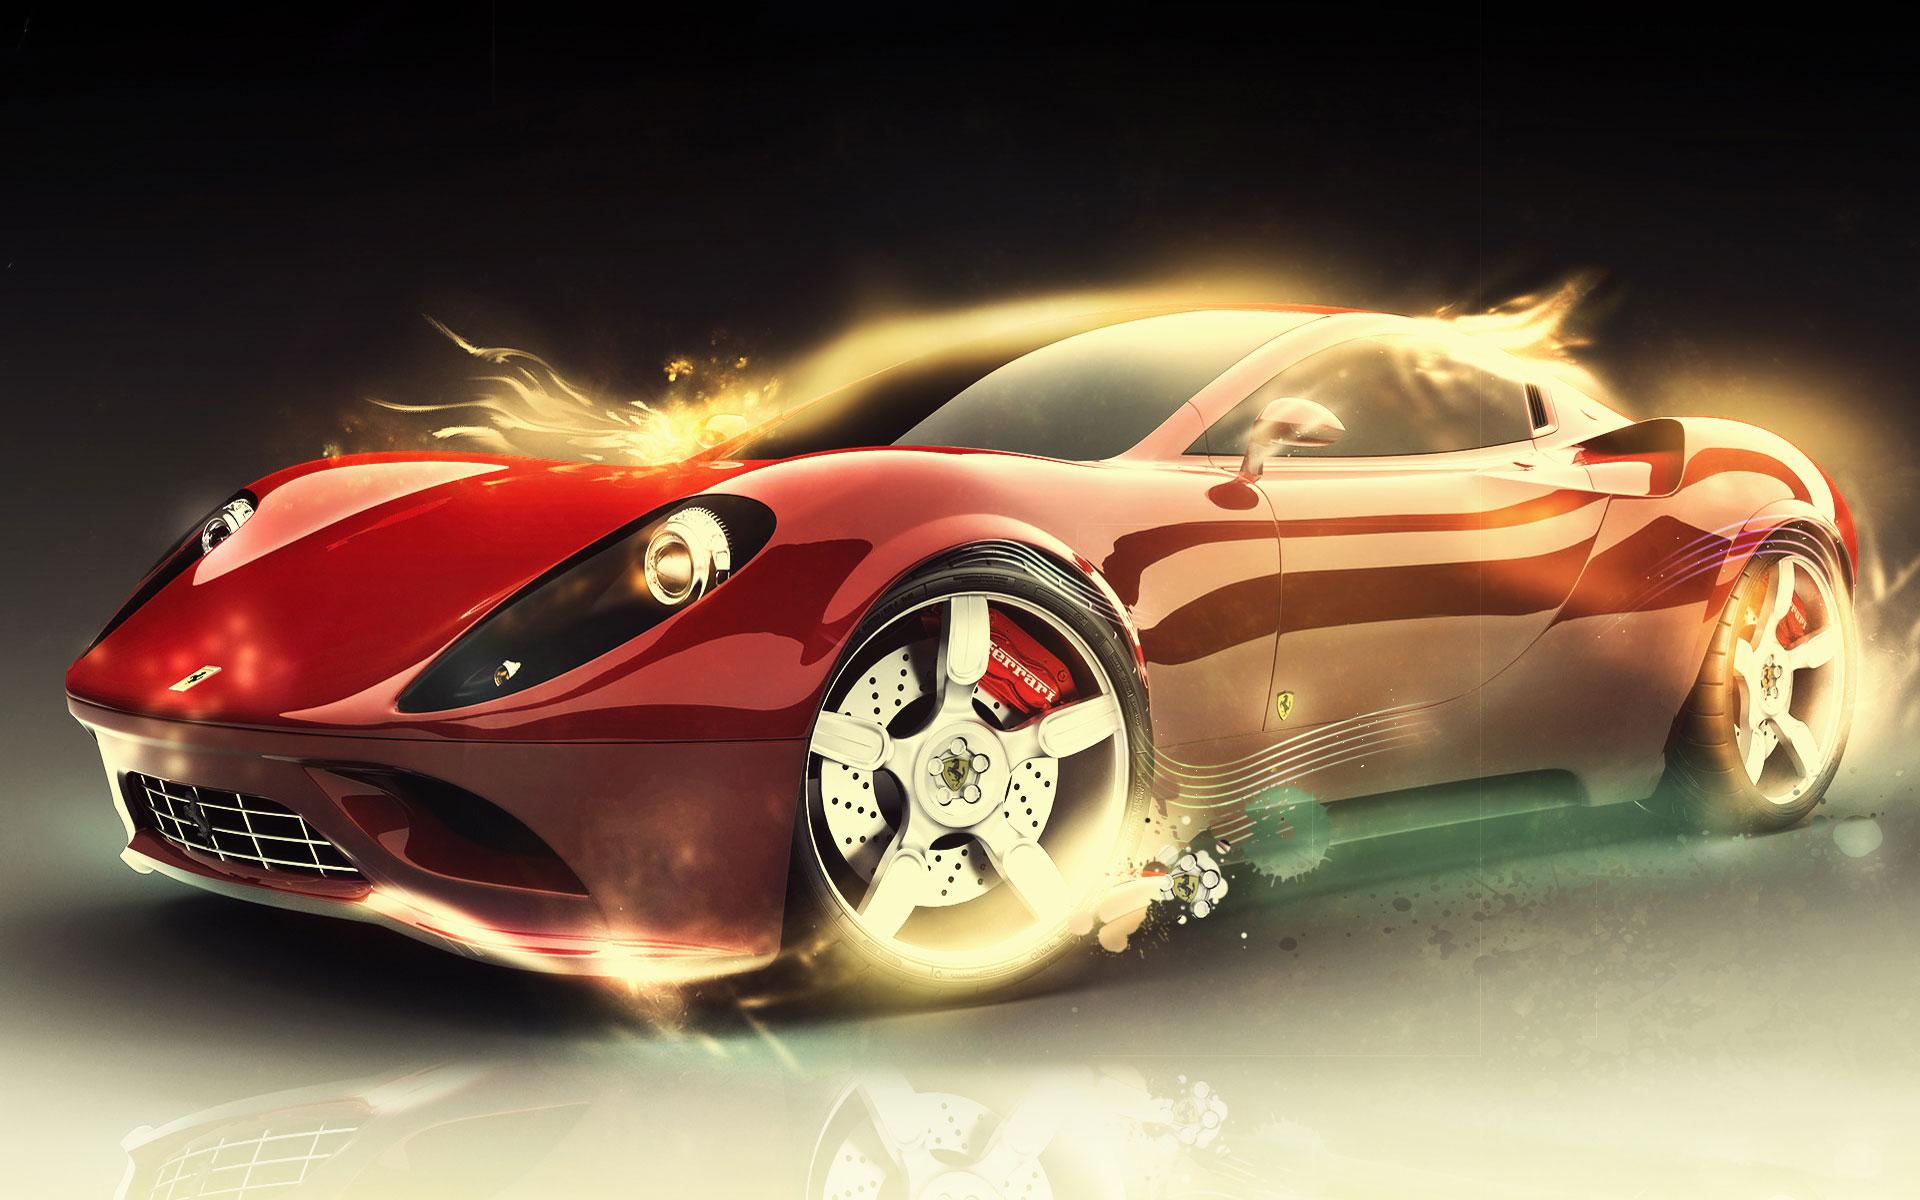 Ferrari Hd Wallpaper For Laptop